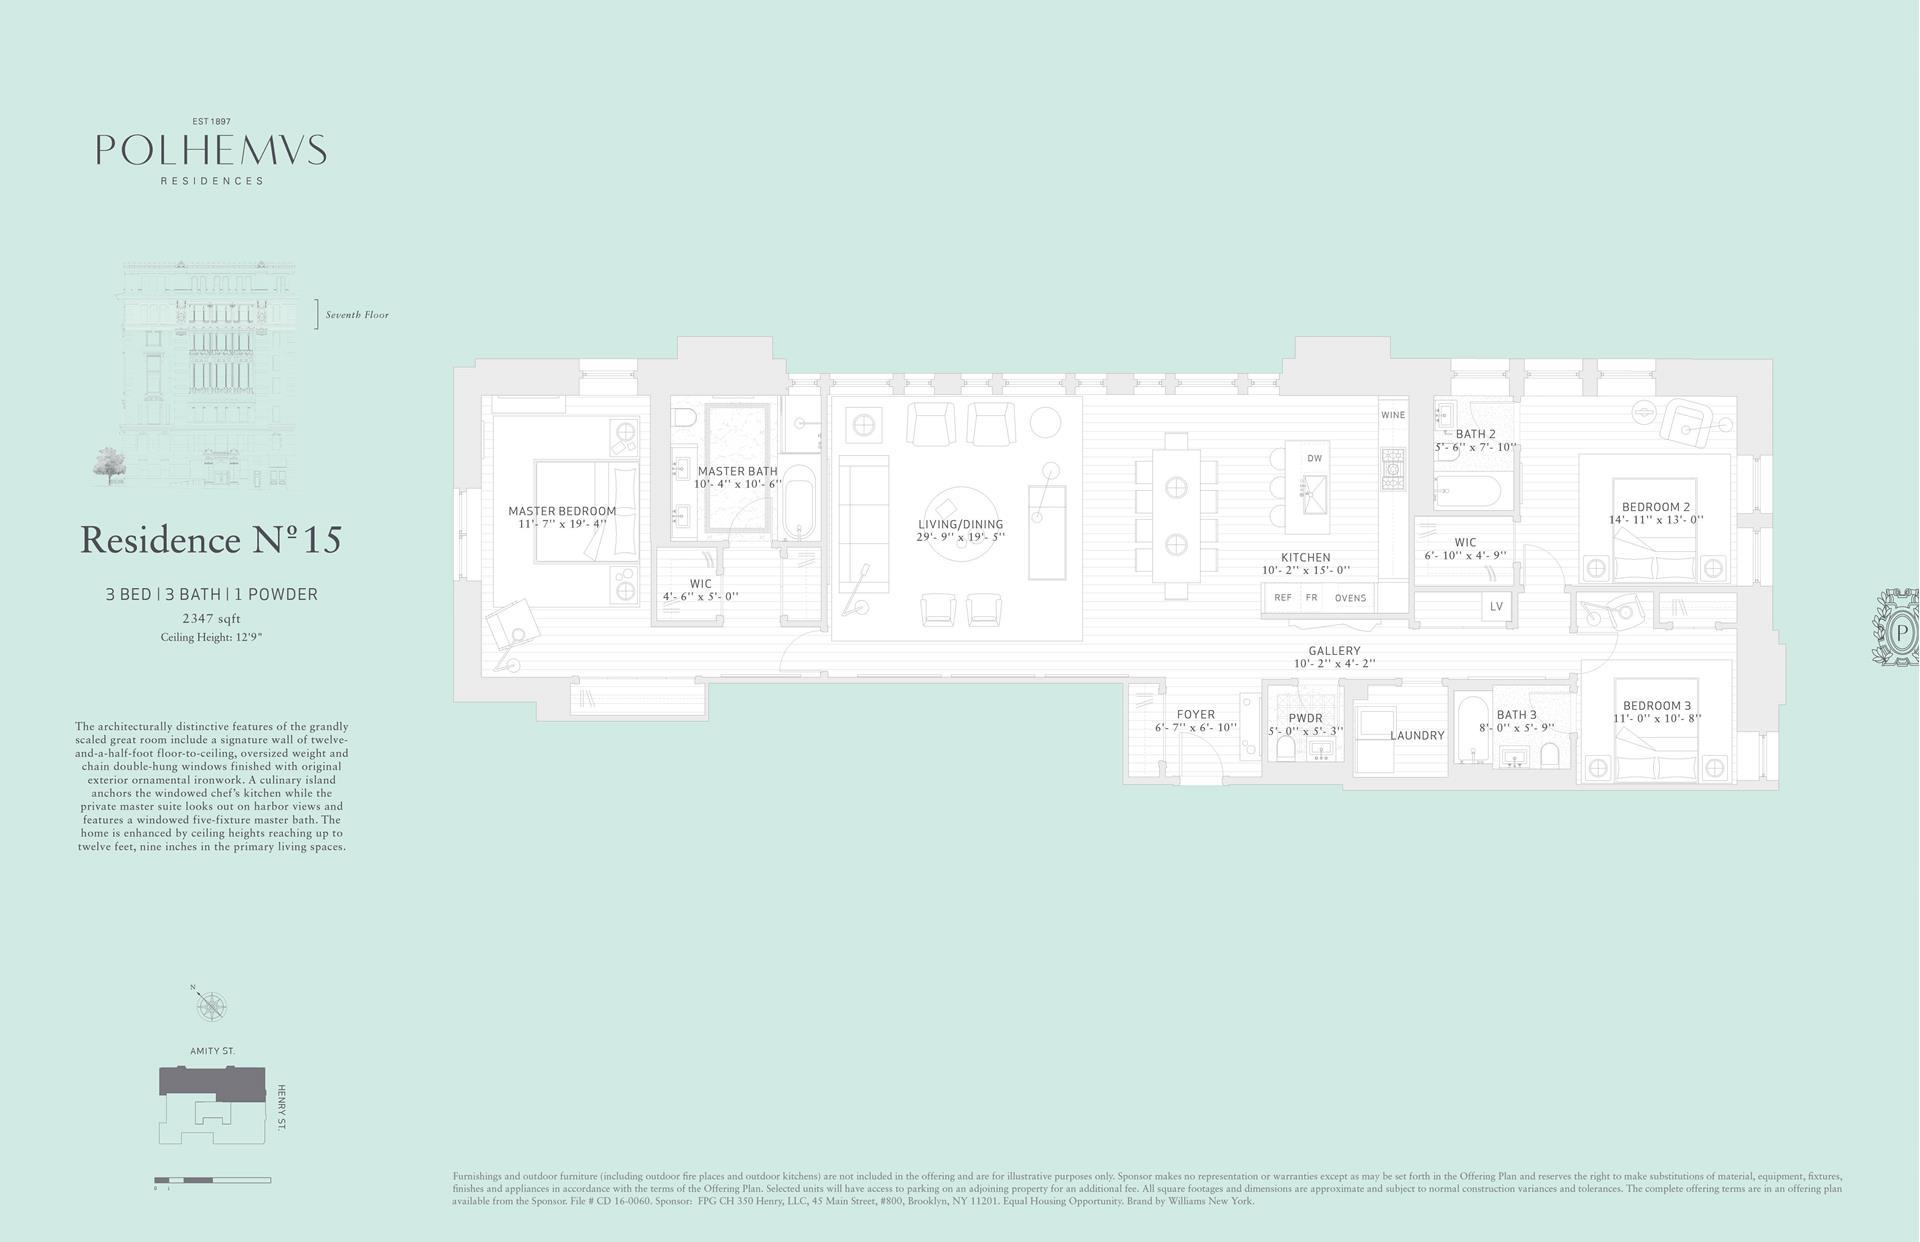 Floor plan of Polhemus, 100 Amity St, RES15 - Cobble Hill, New York